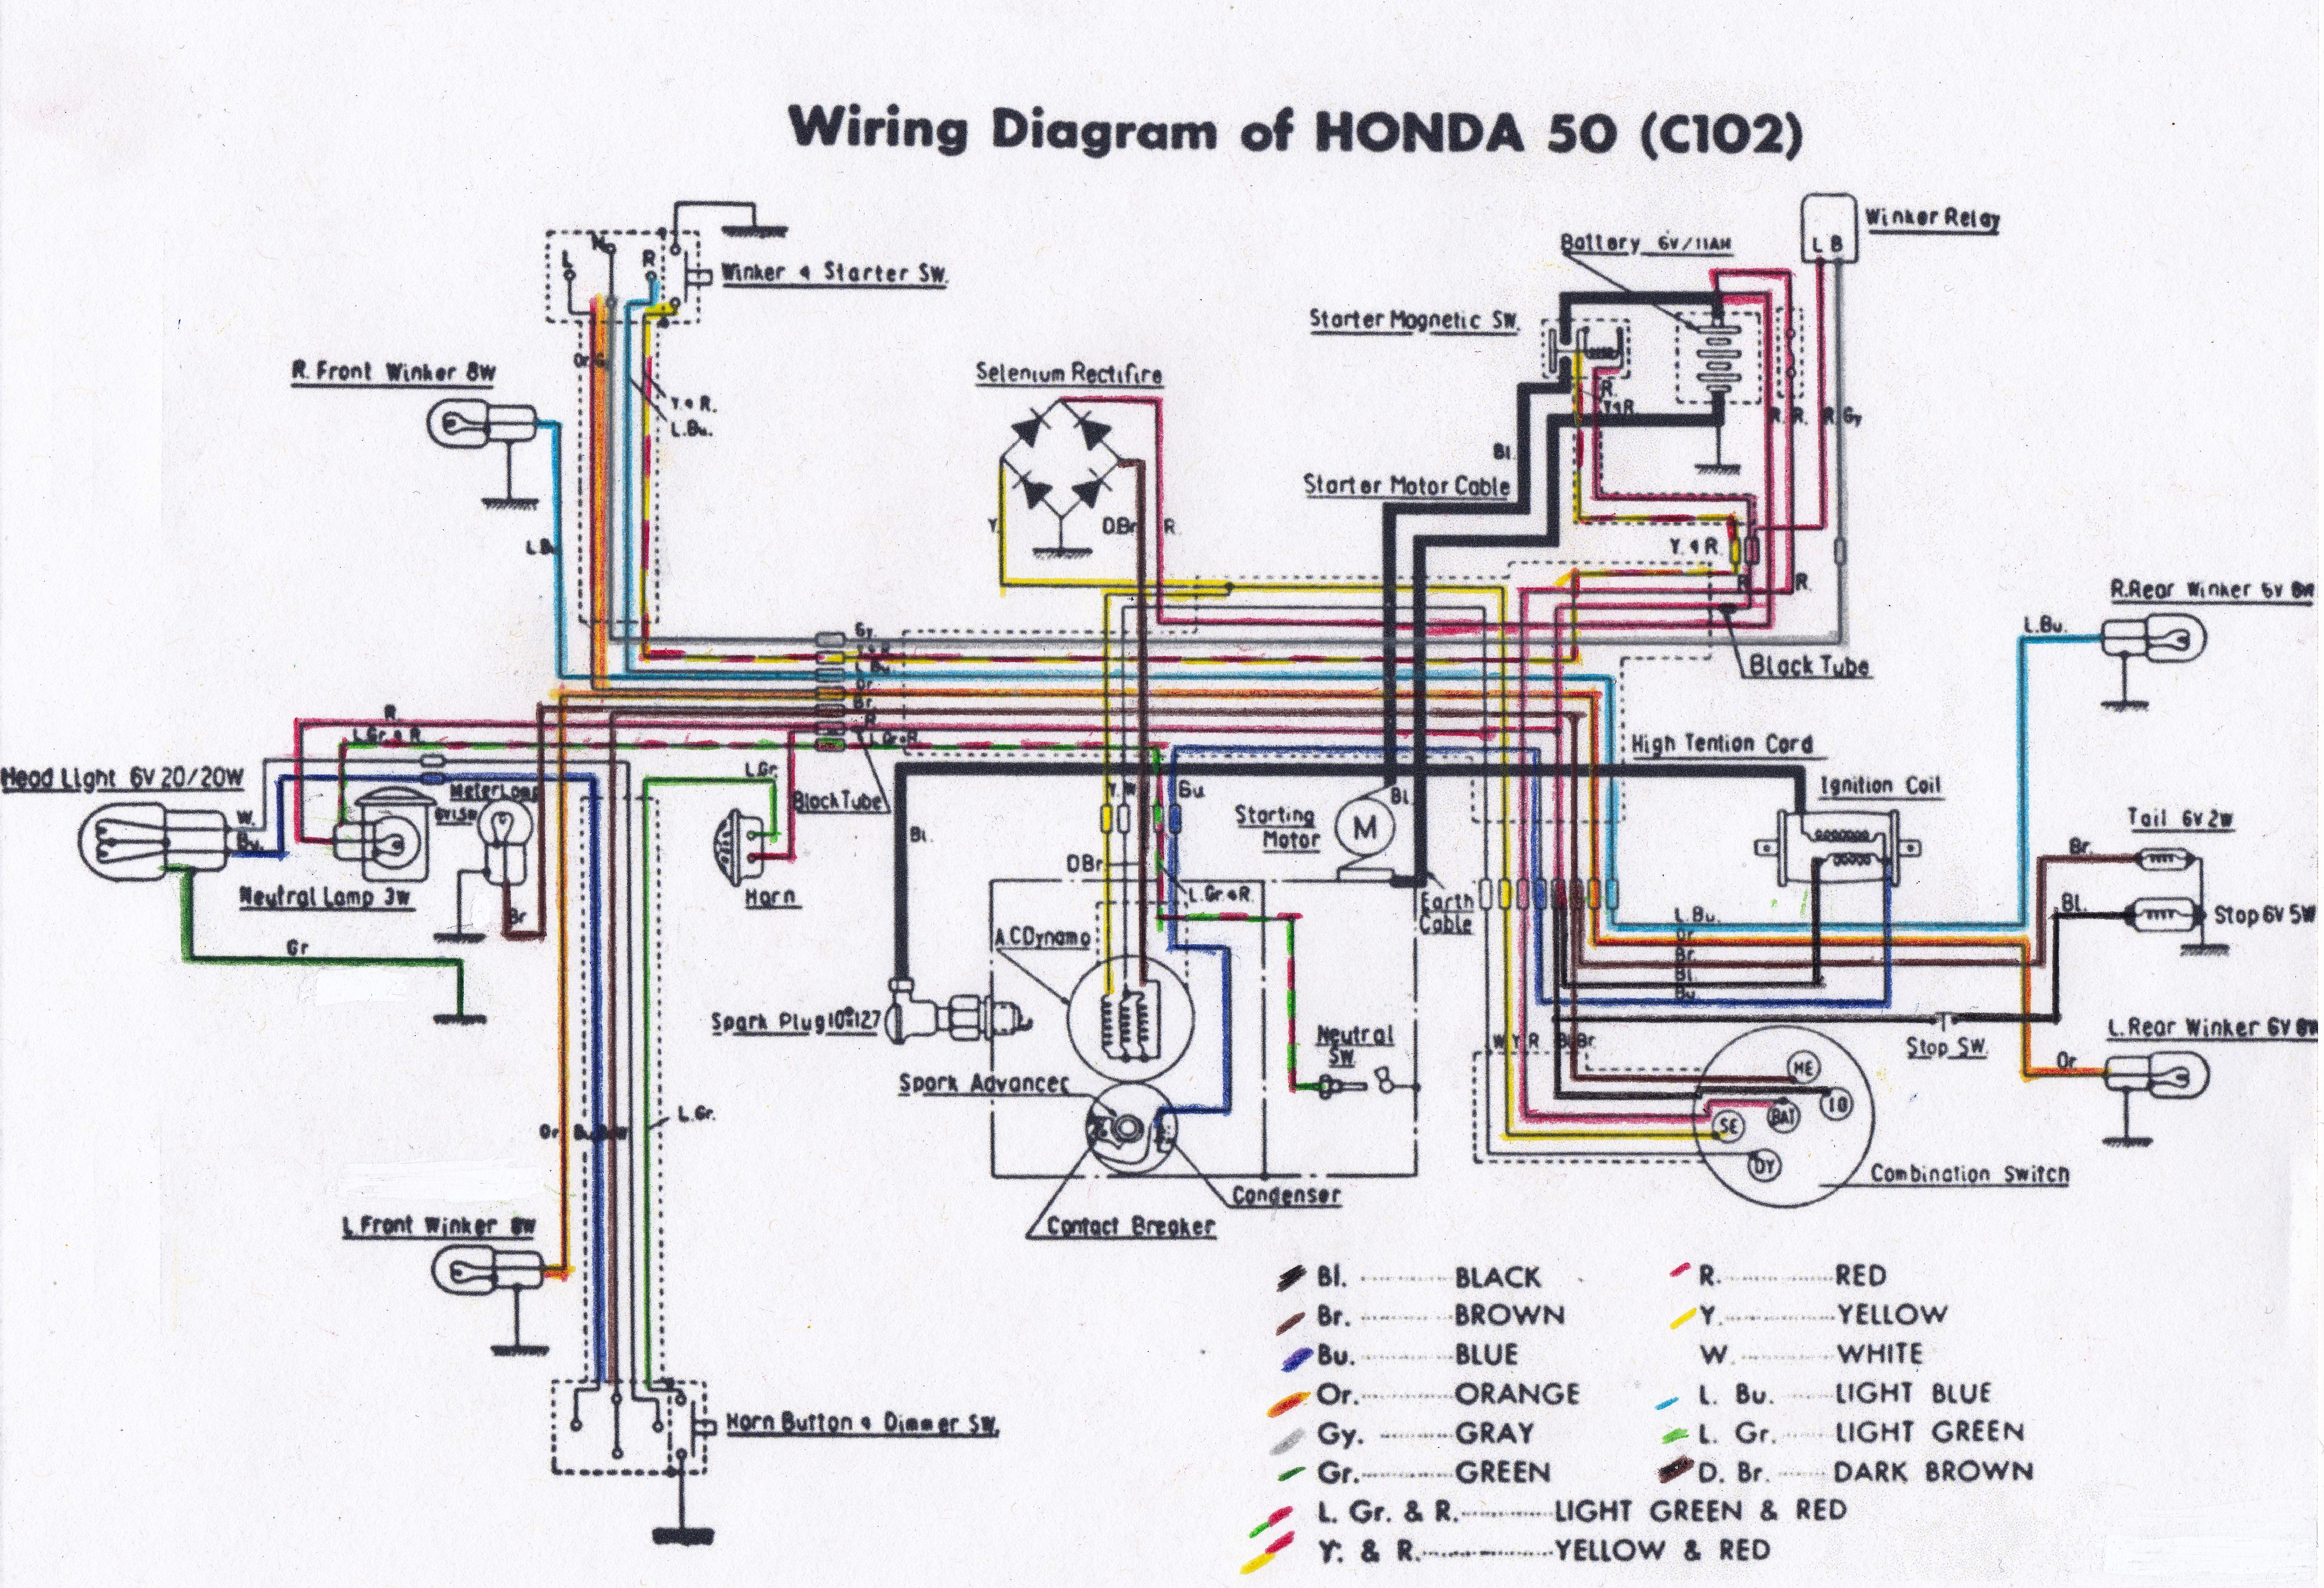 Honda C102 Wiring schematic, Colourized